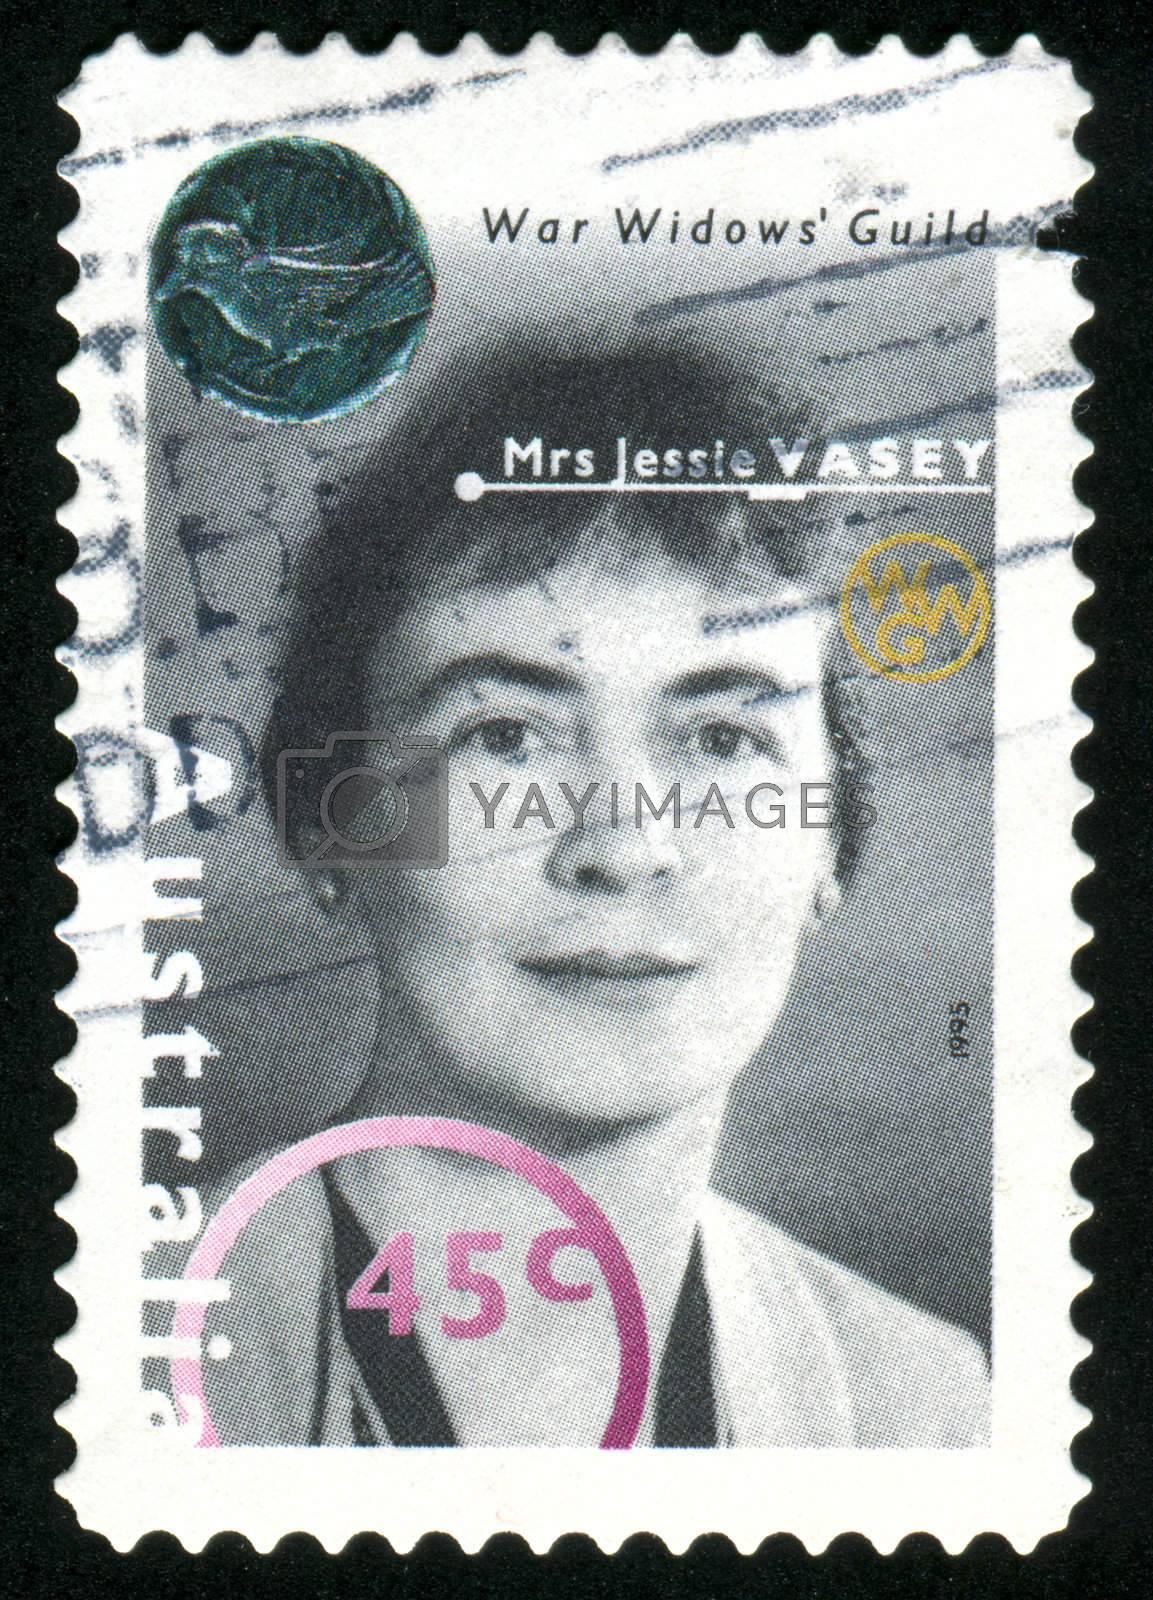 AUSTRALIA - CIRCA 1995: stamp printed by Australia, shows Mrs. Jessie Vasey, circa 1995